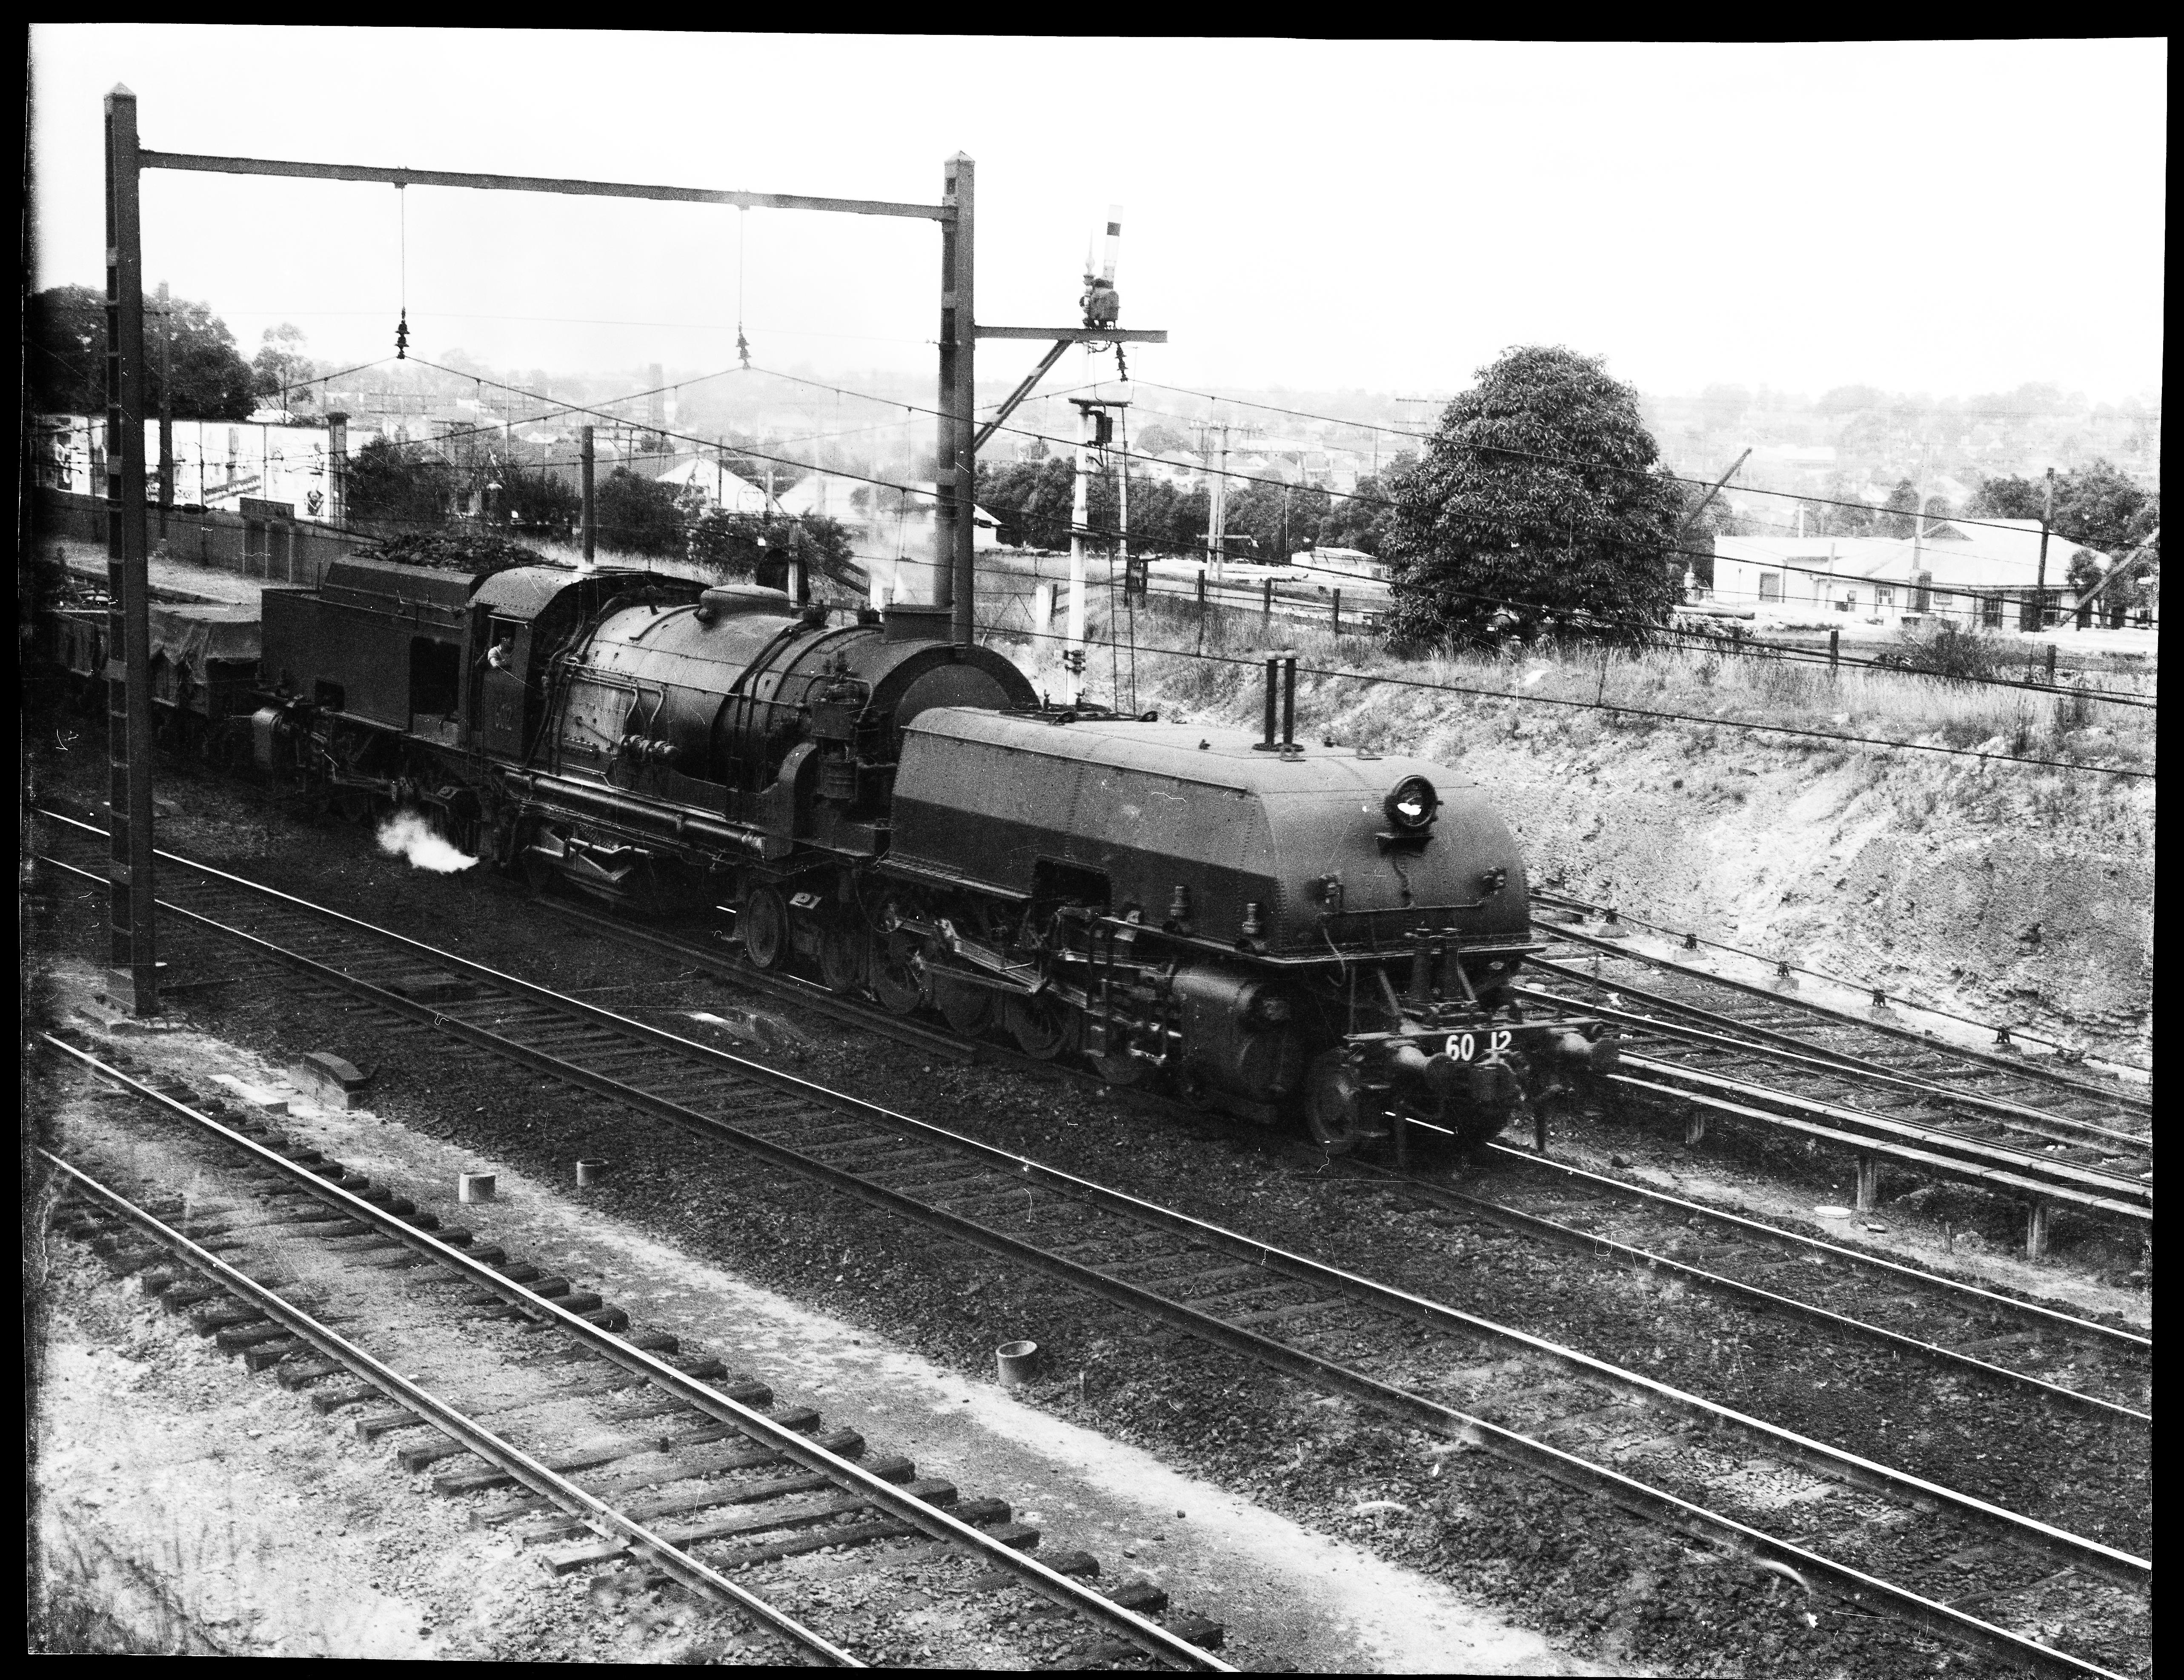 Locomotive No. 6012 [n.d.]